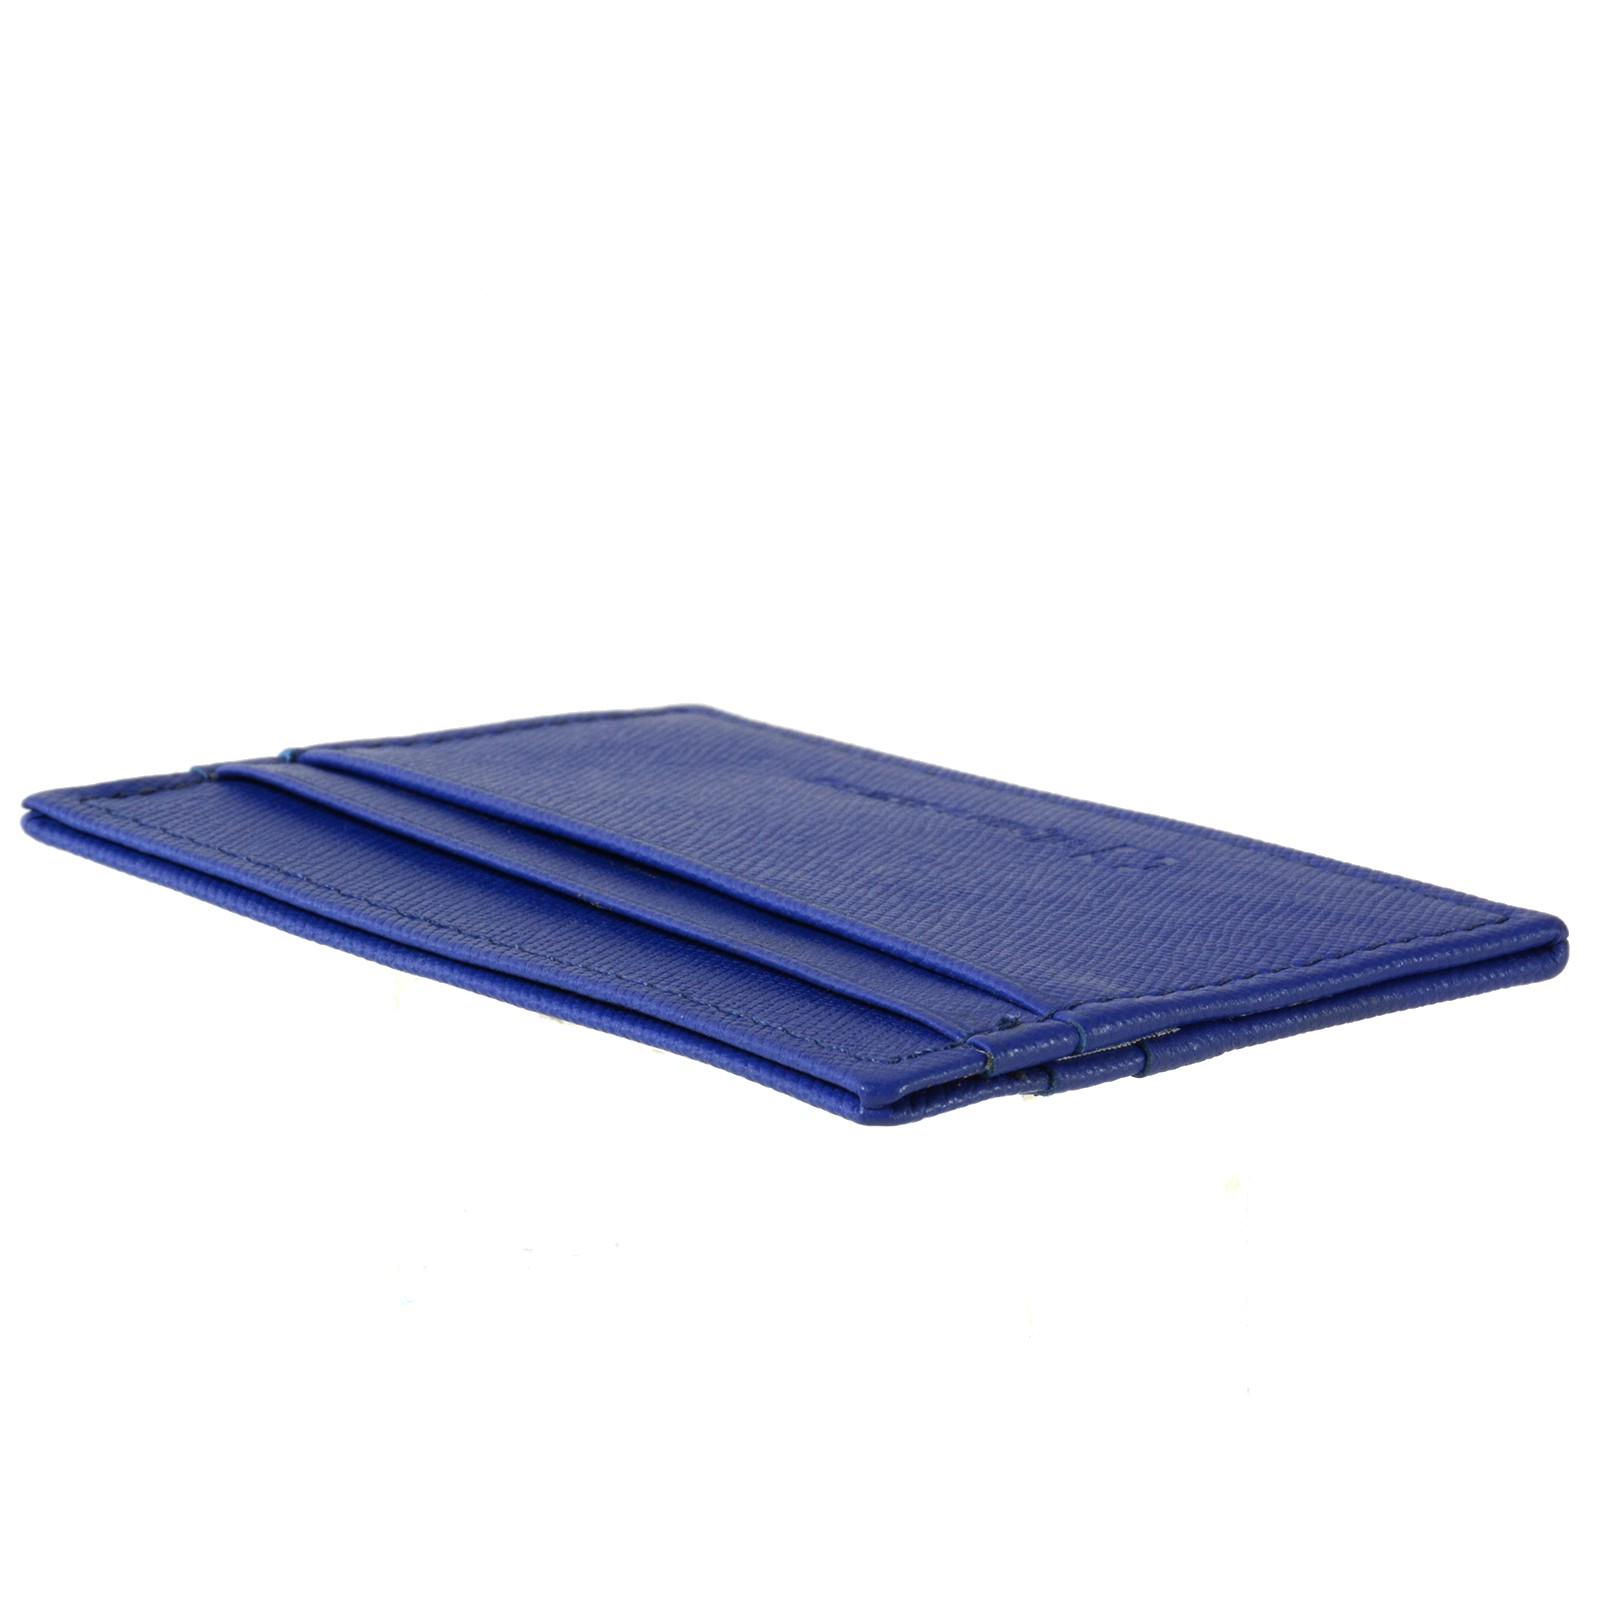 Alpine-Swiss-Minimalist-Leather-Front-Pocket-Wallet-5-Card-Slots-Slim-Thin-Case thumbnail 39